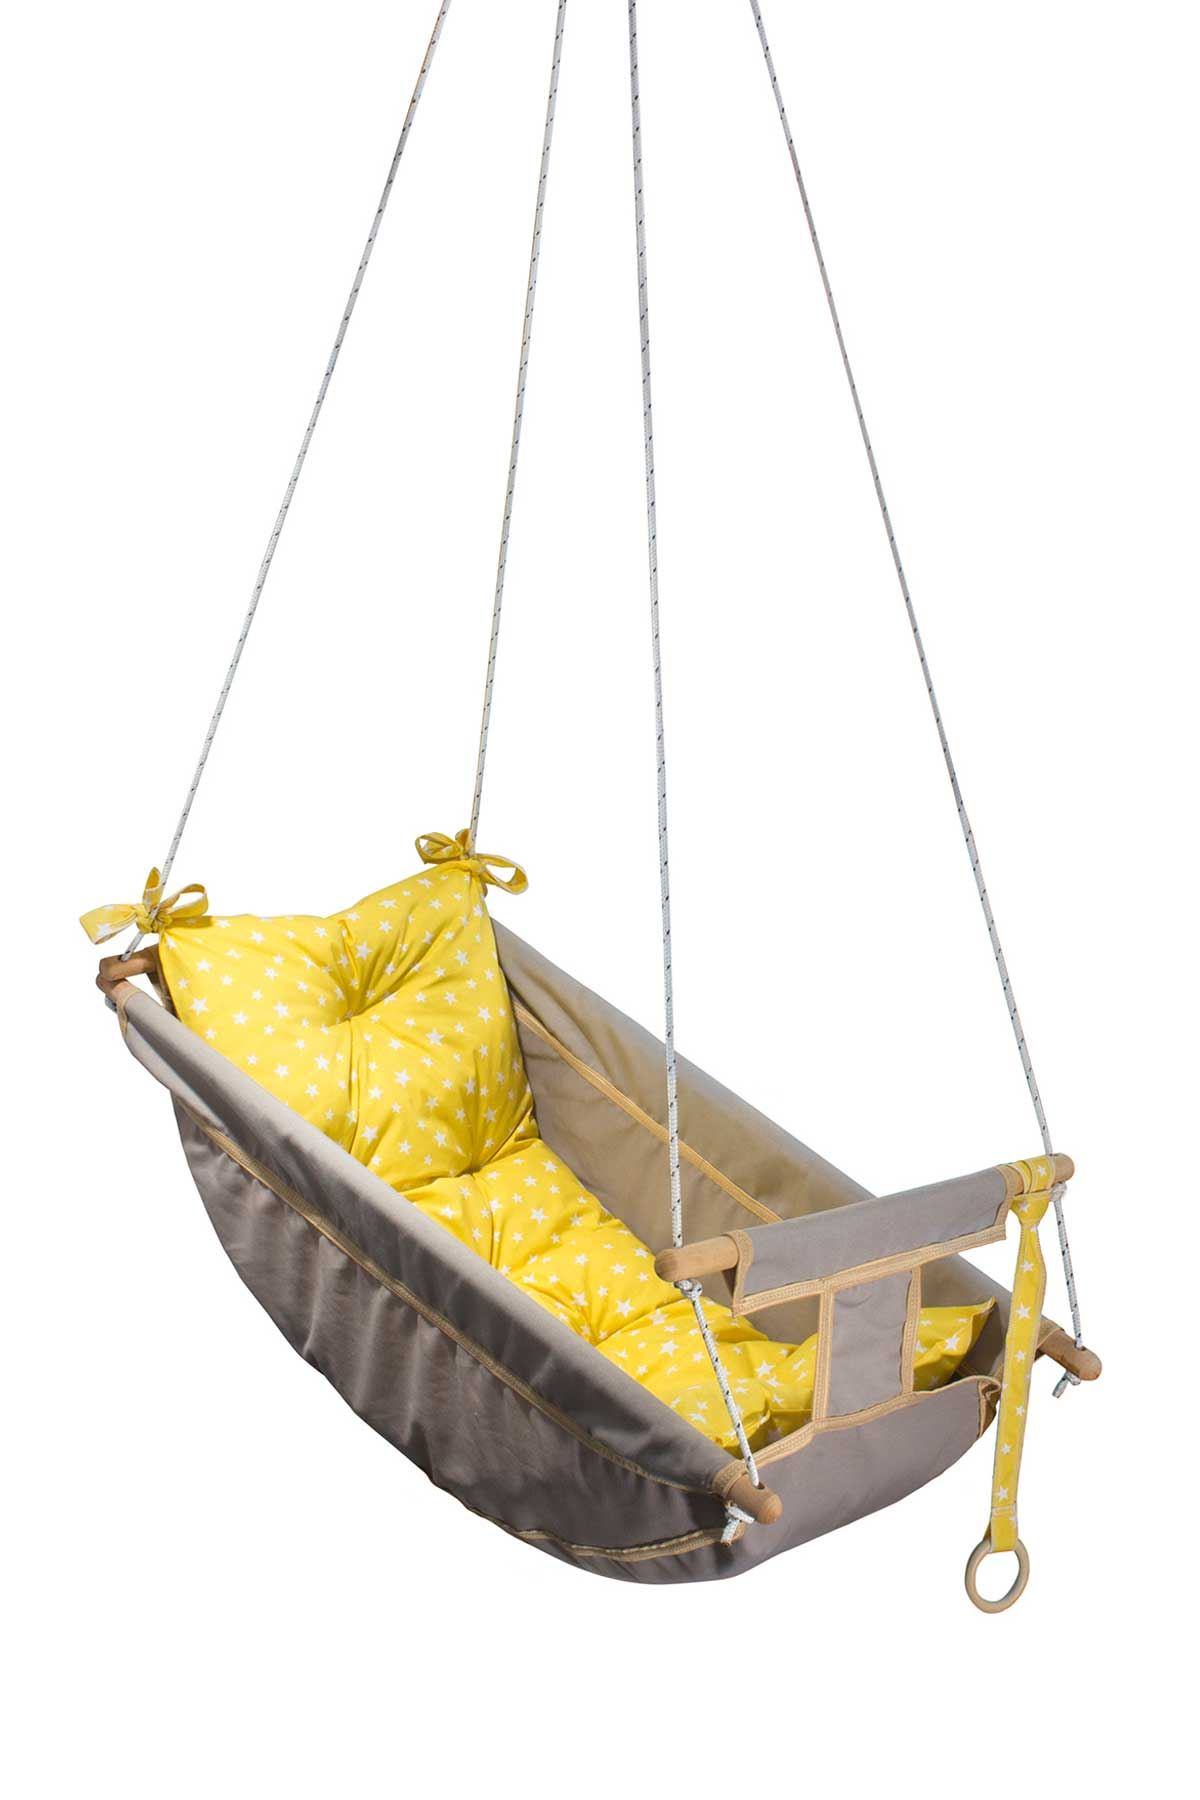 Gray Bundera Kids Baby Sleeping Swing Wooden Hammock Cradle Swing